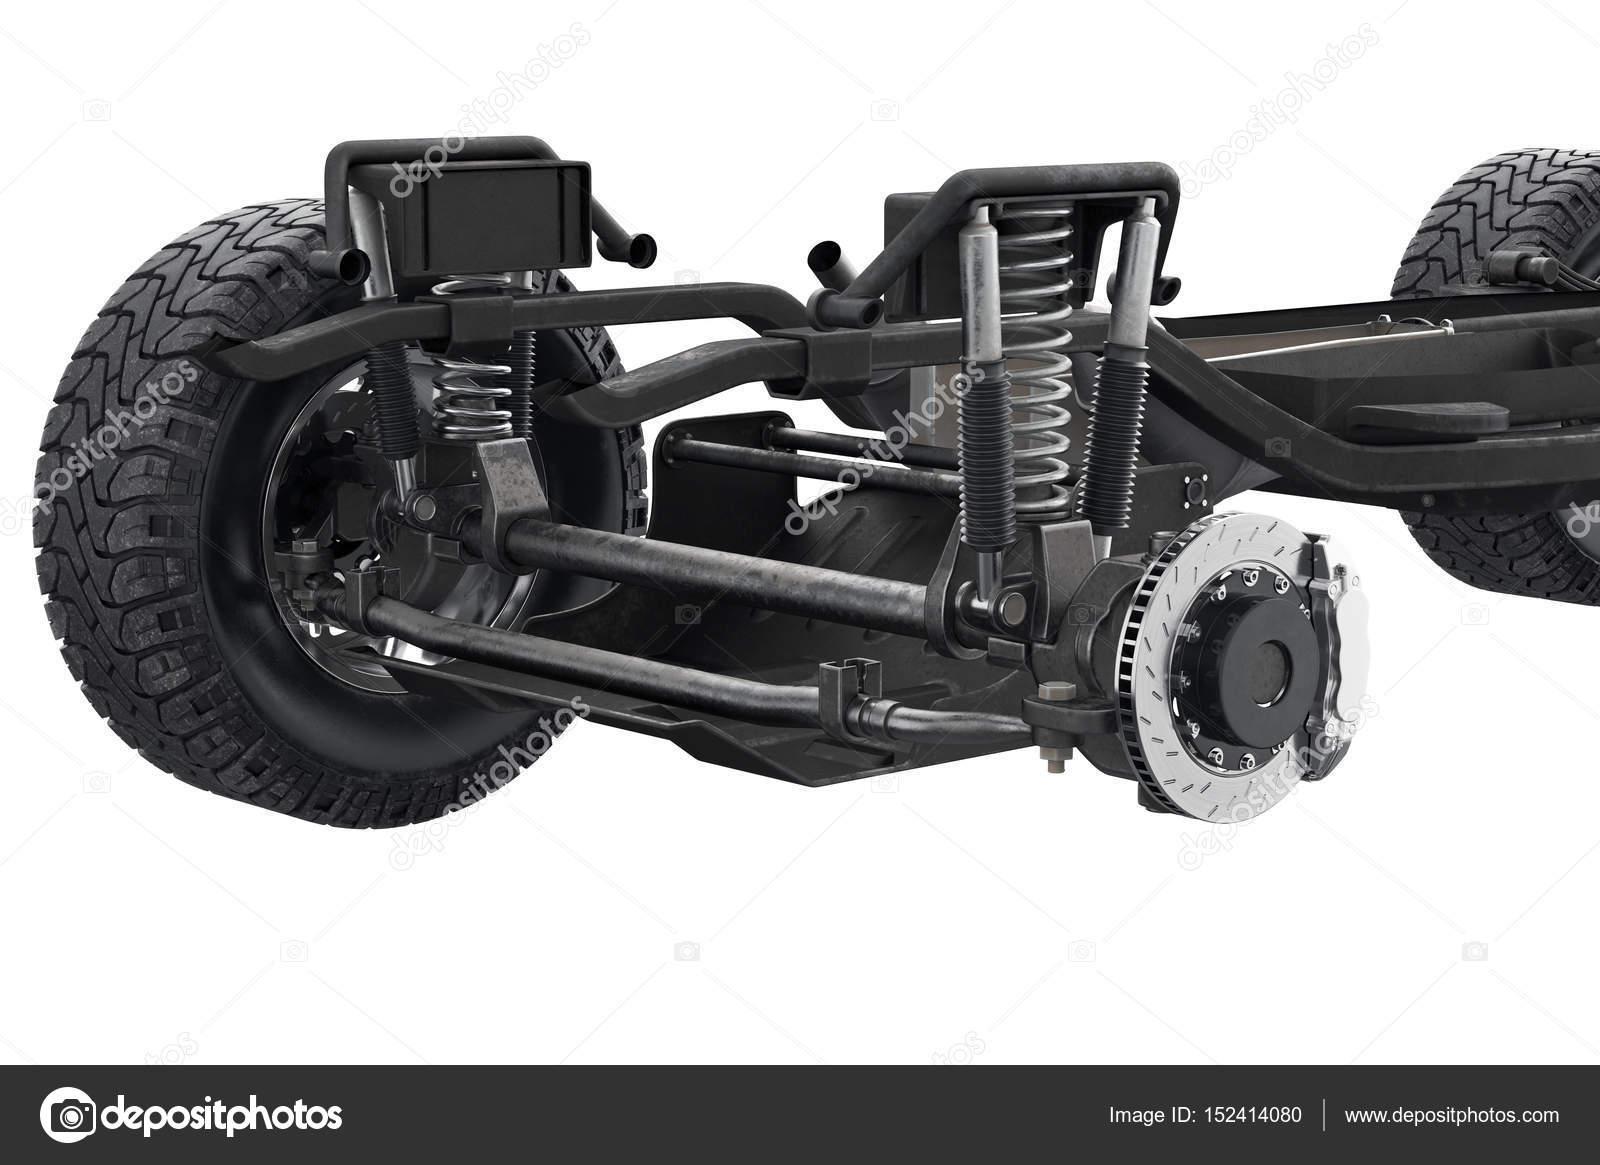 Chasis bastidor suspensión, visión cercana — Fotos de Stock ...